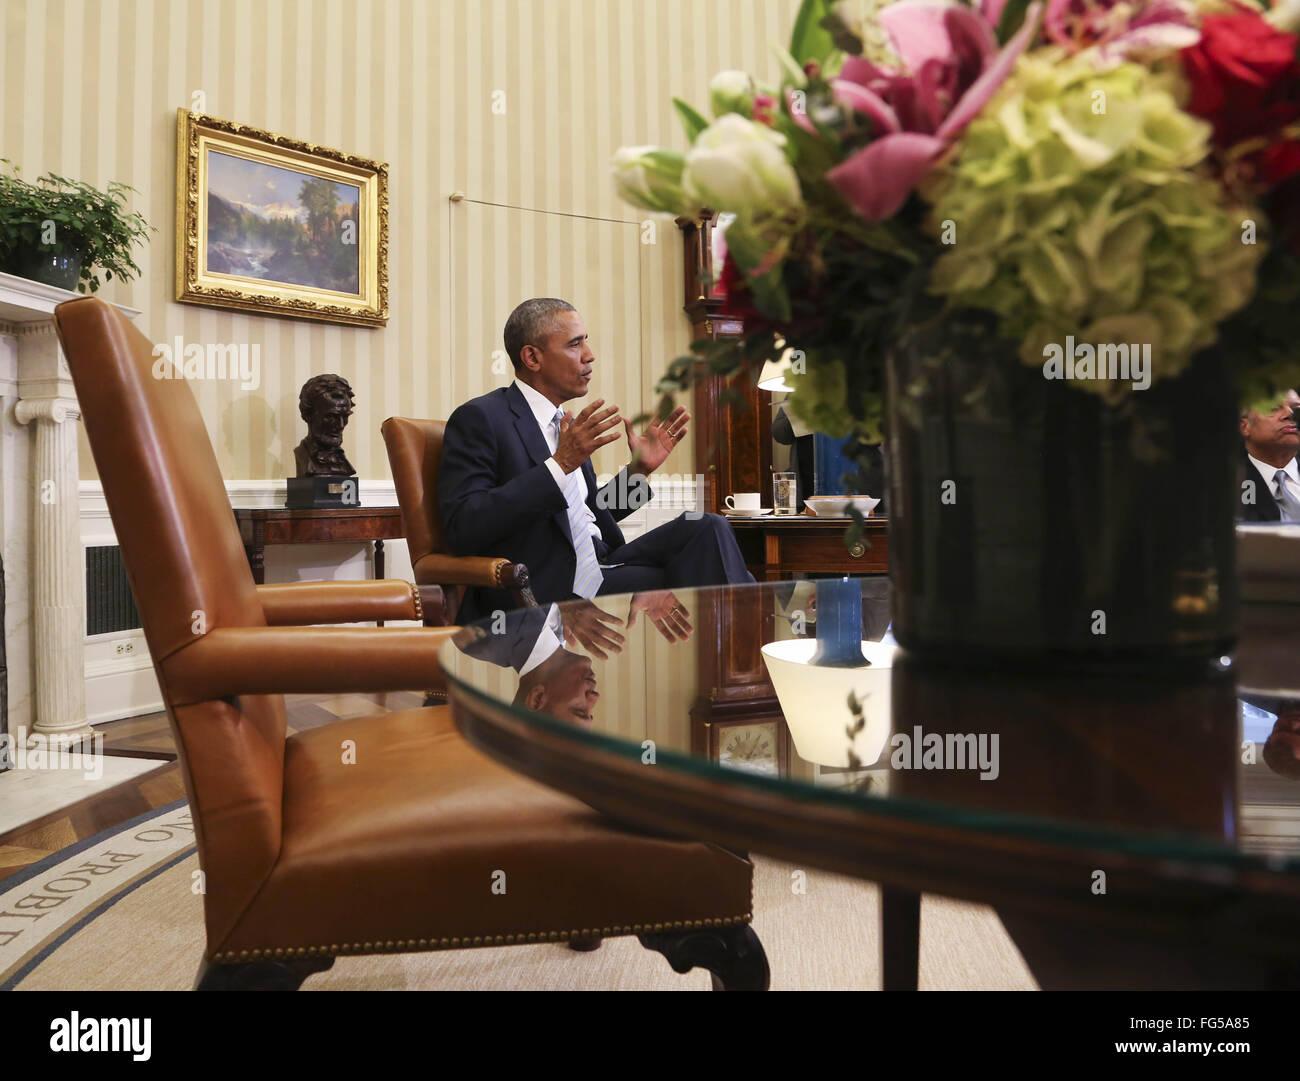 Washington DC, USA. 17th February, 2016.  United States President Barack Obama meets with former National Security - Stock Image